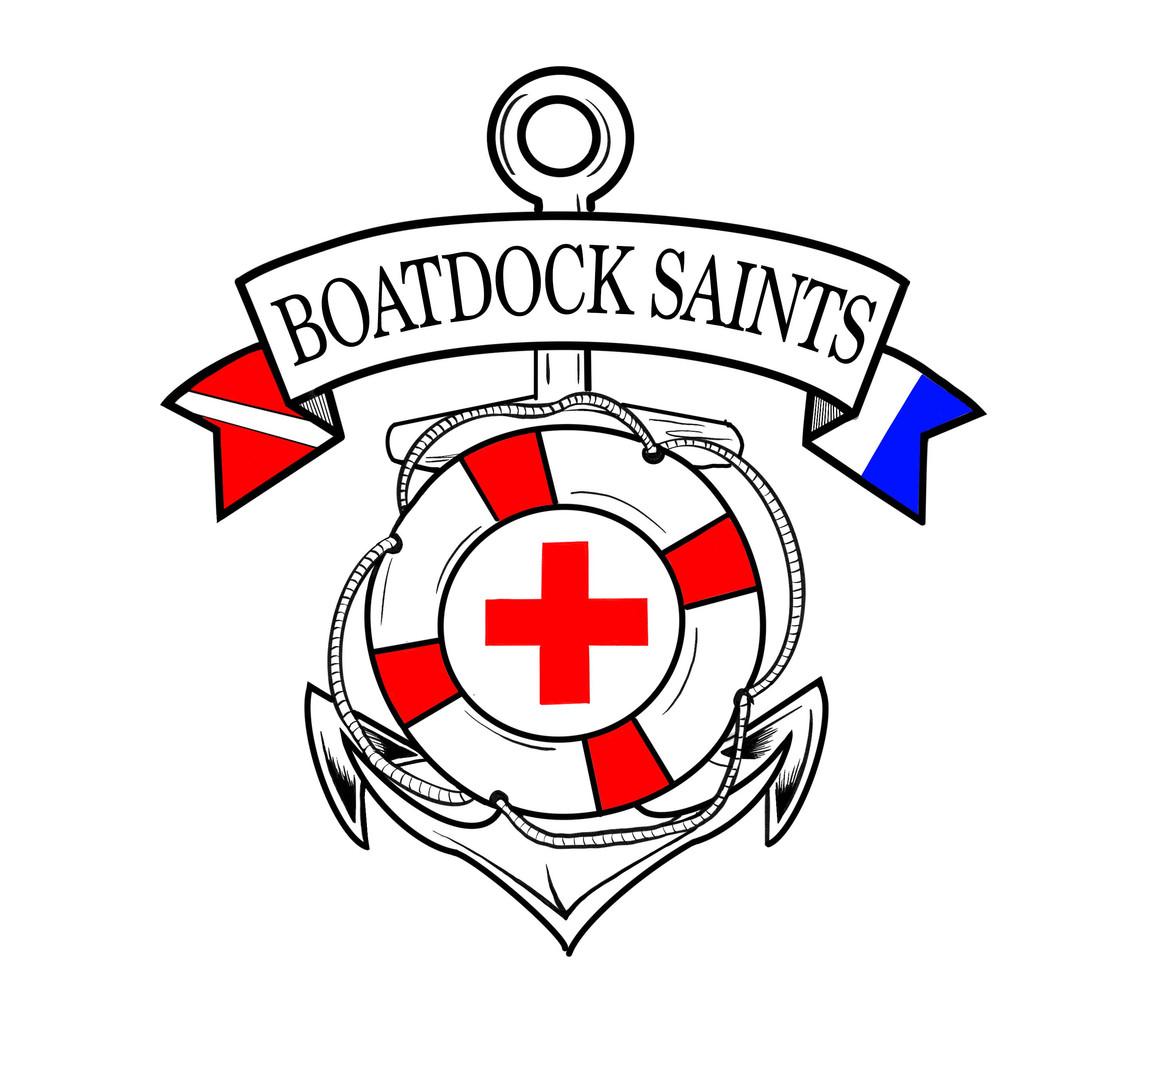 boatdock saints.jpg